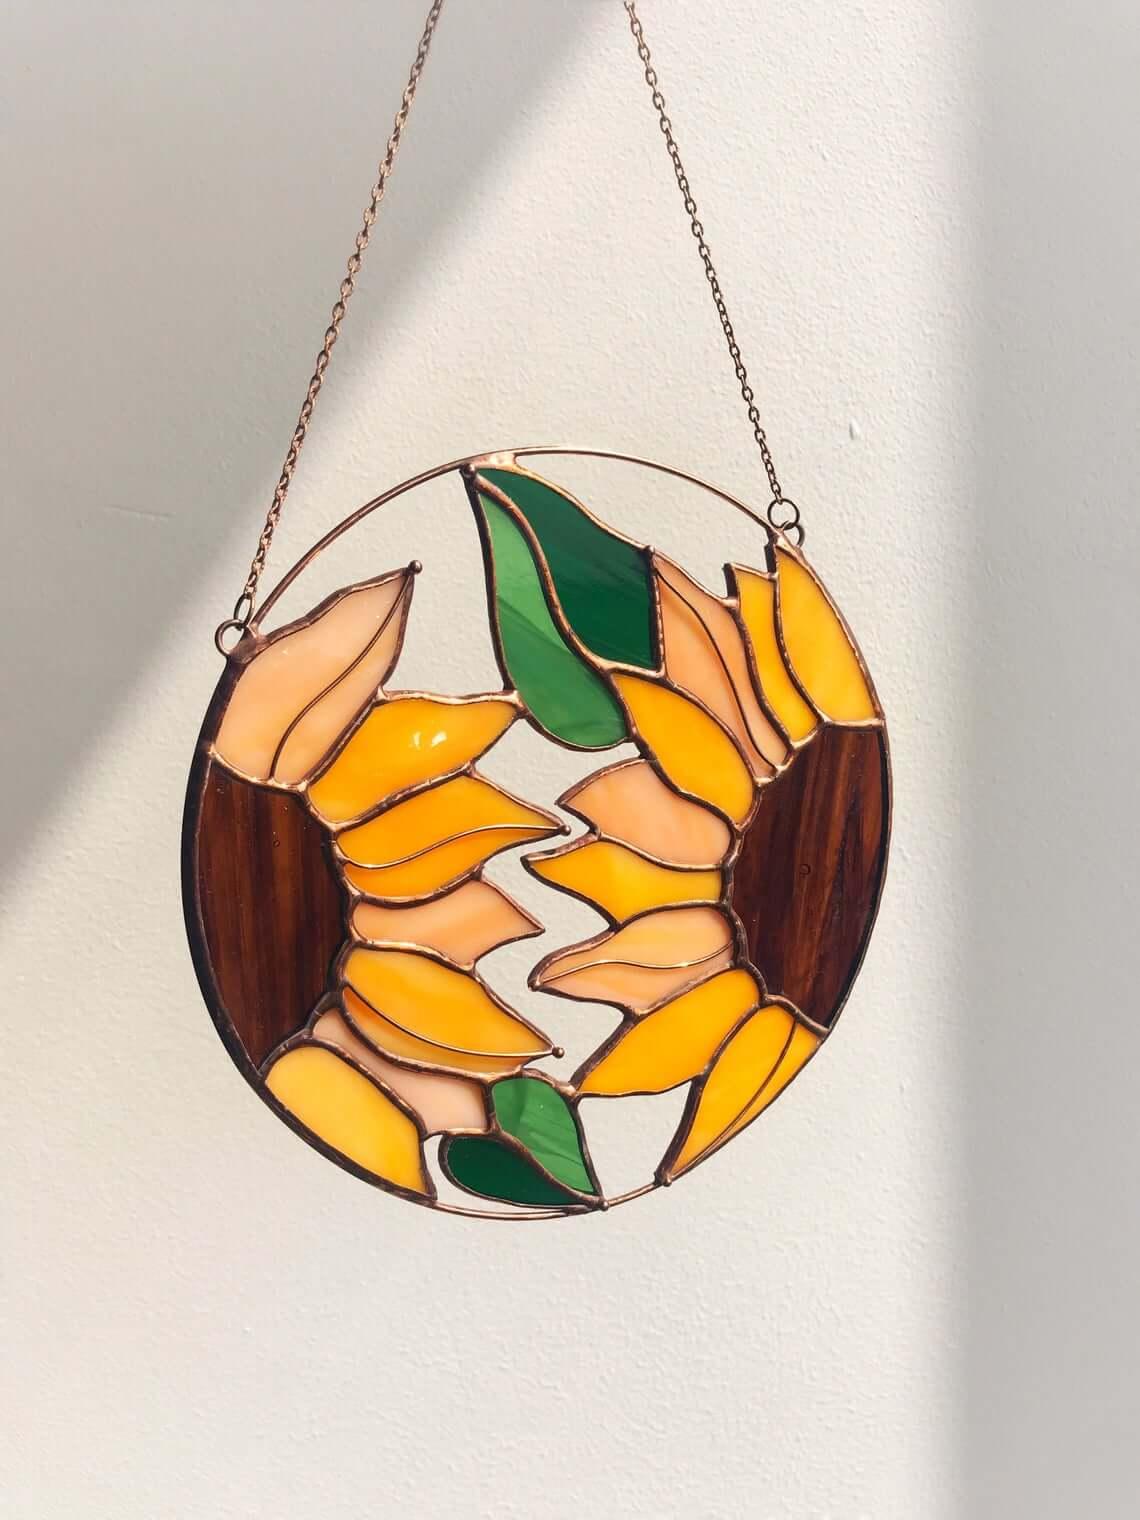 Delicate Stained Glass Sunflower Suncatcher